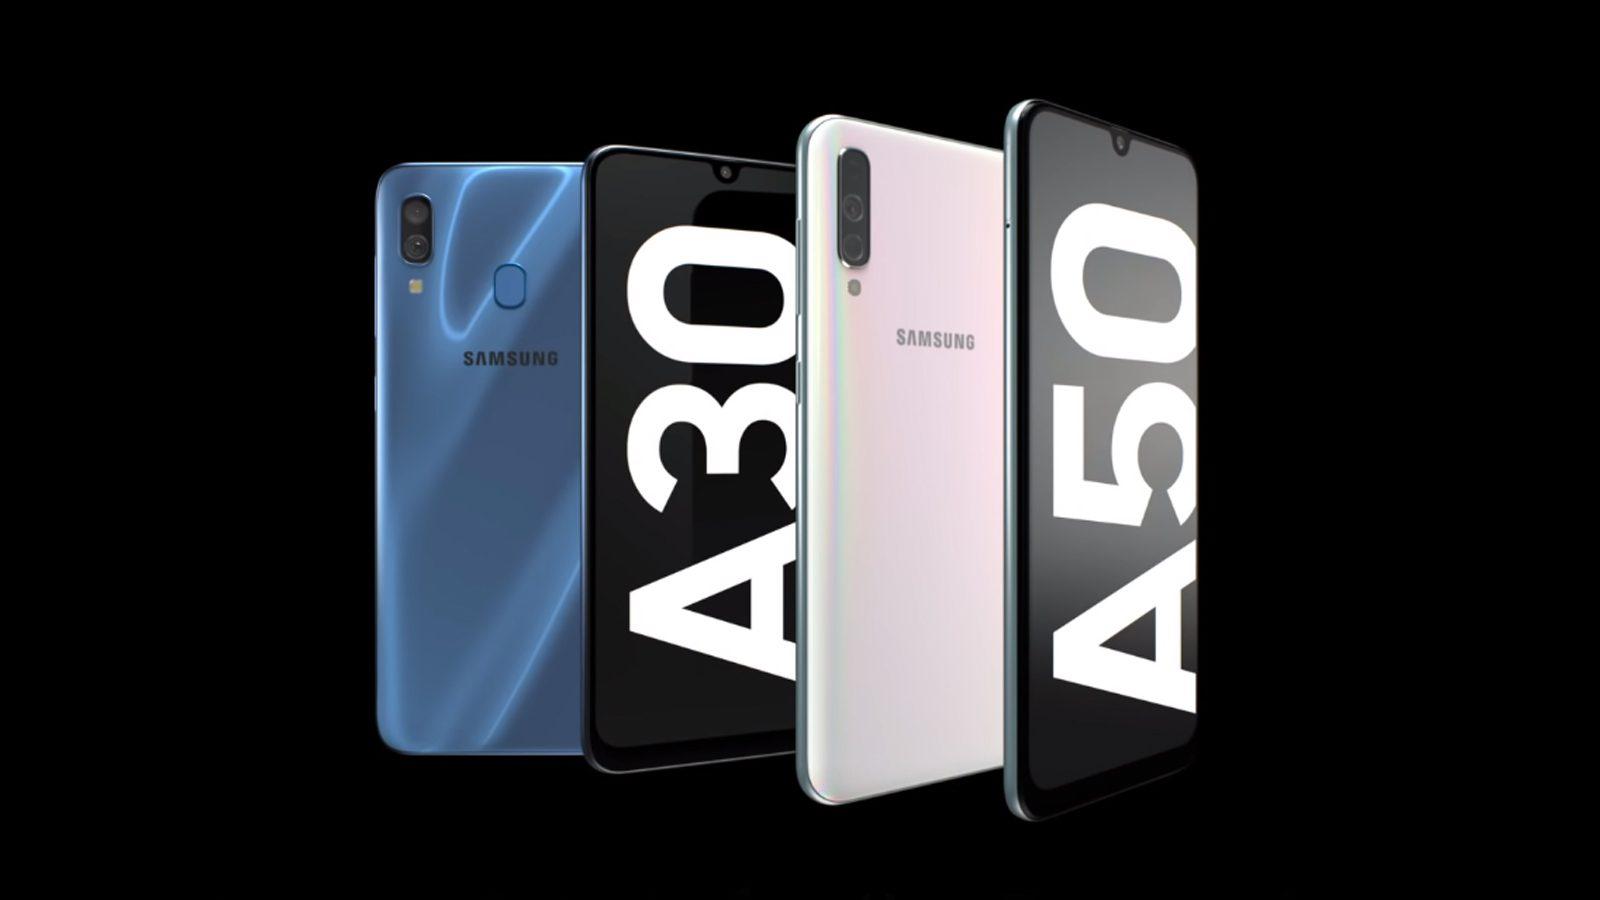 Samsung Galaxy J series merges into Galaxy A series